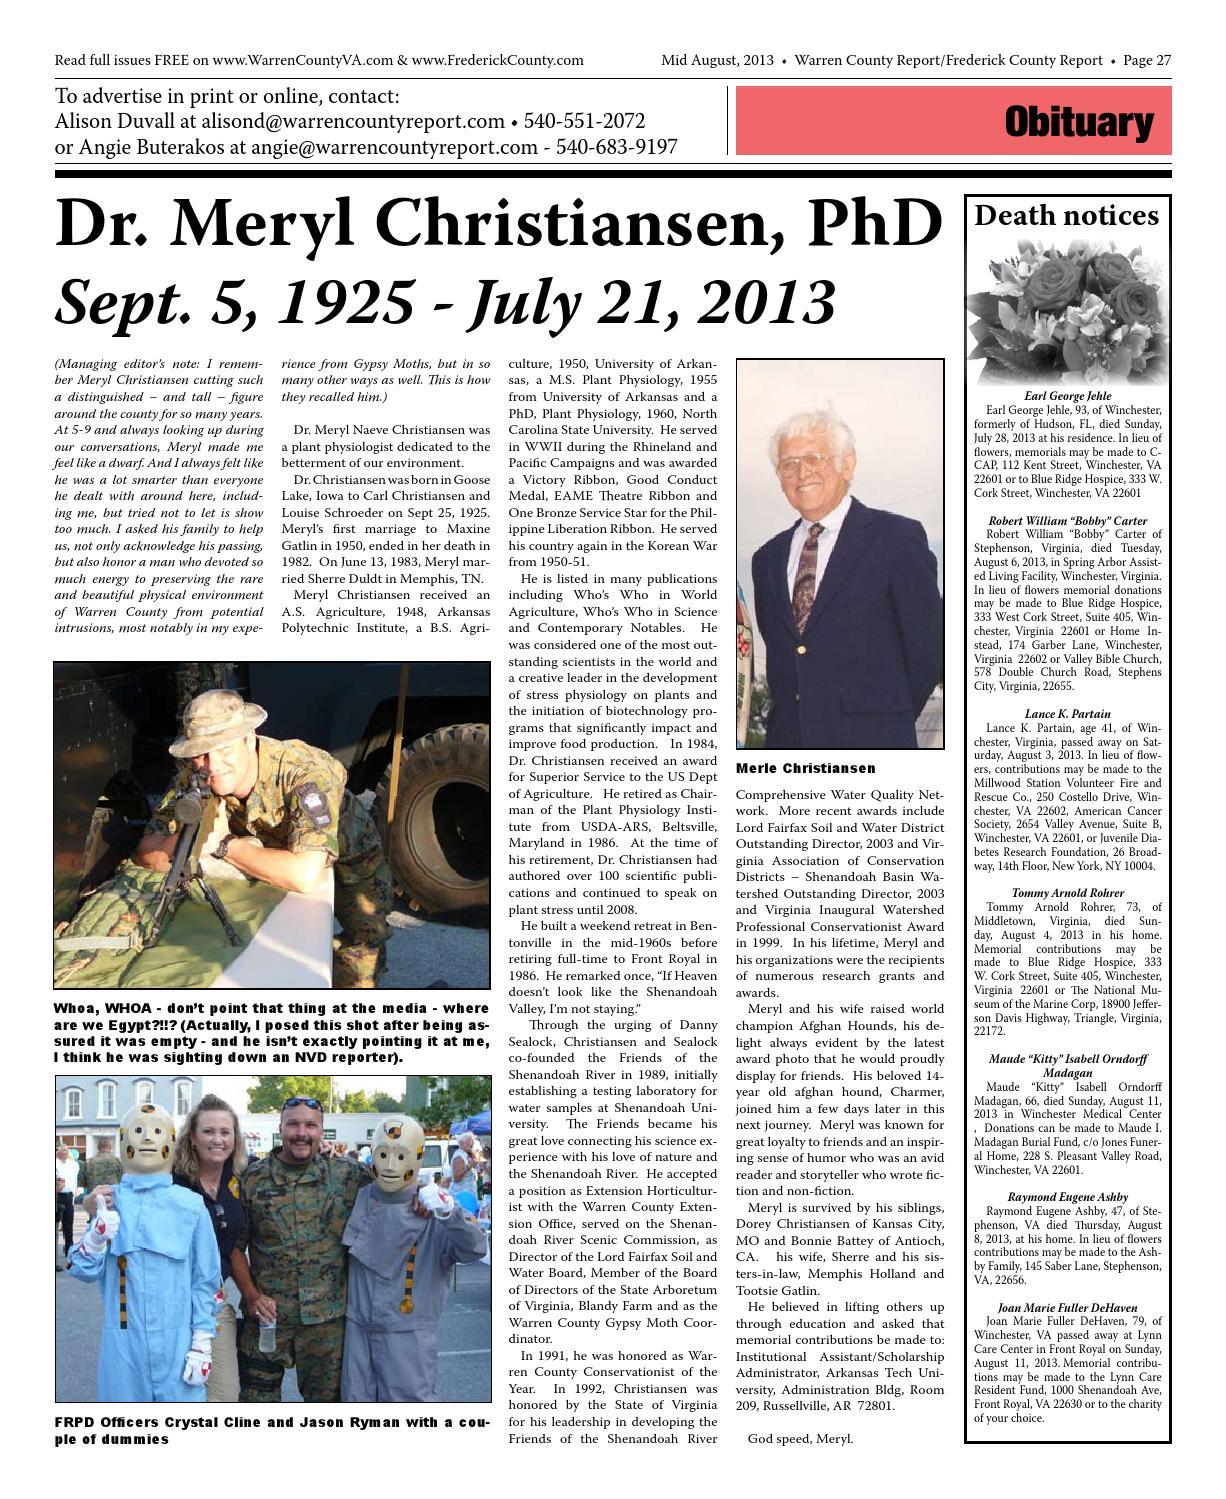 Mid August 2013 Warren Frederick County Report By Warren